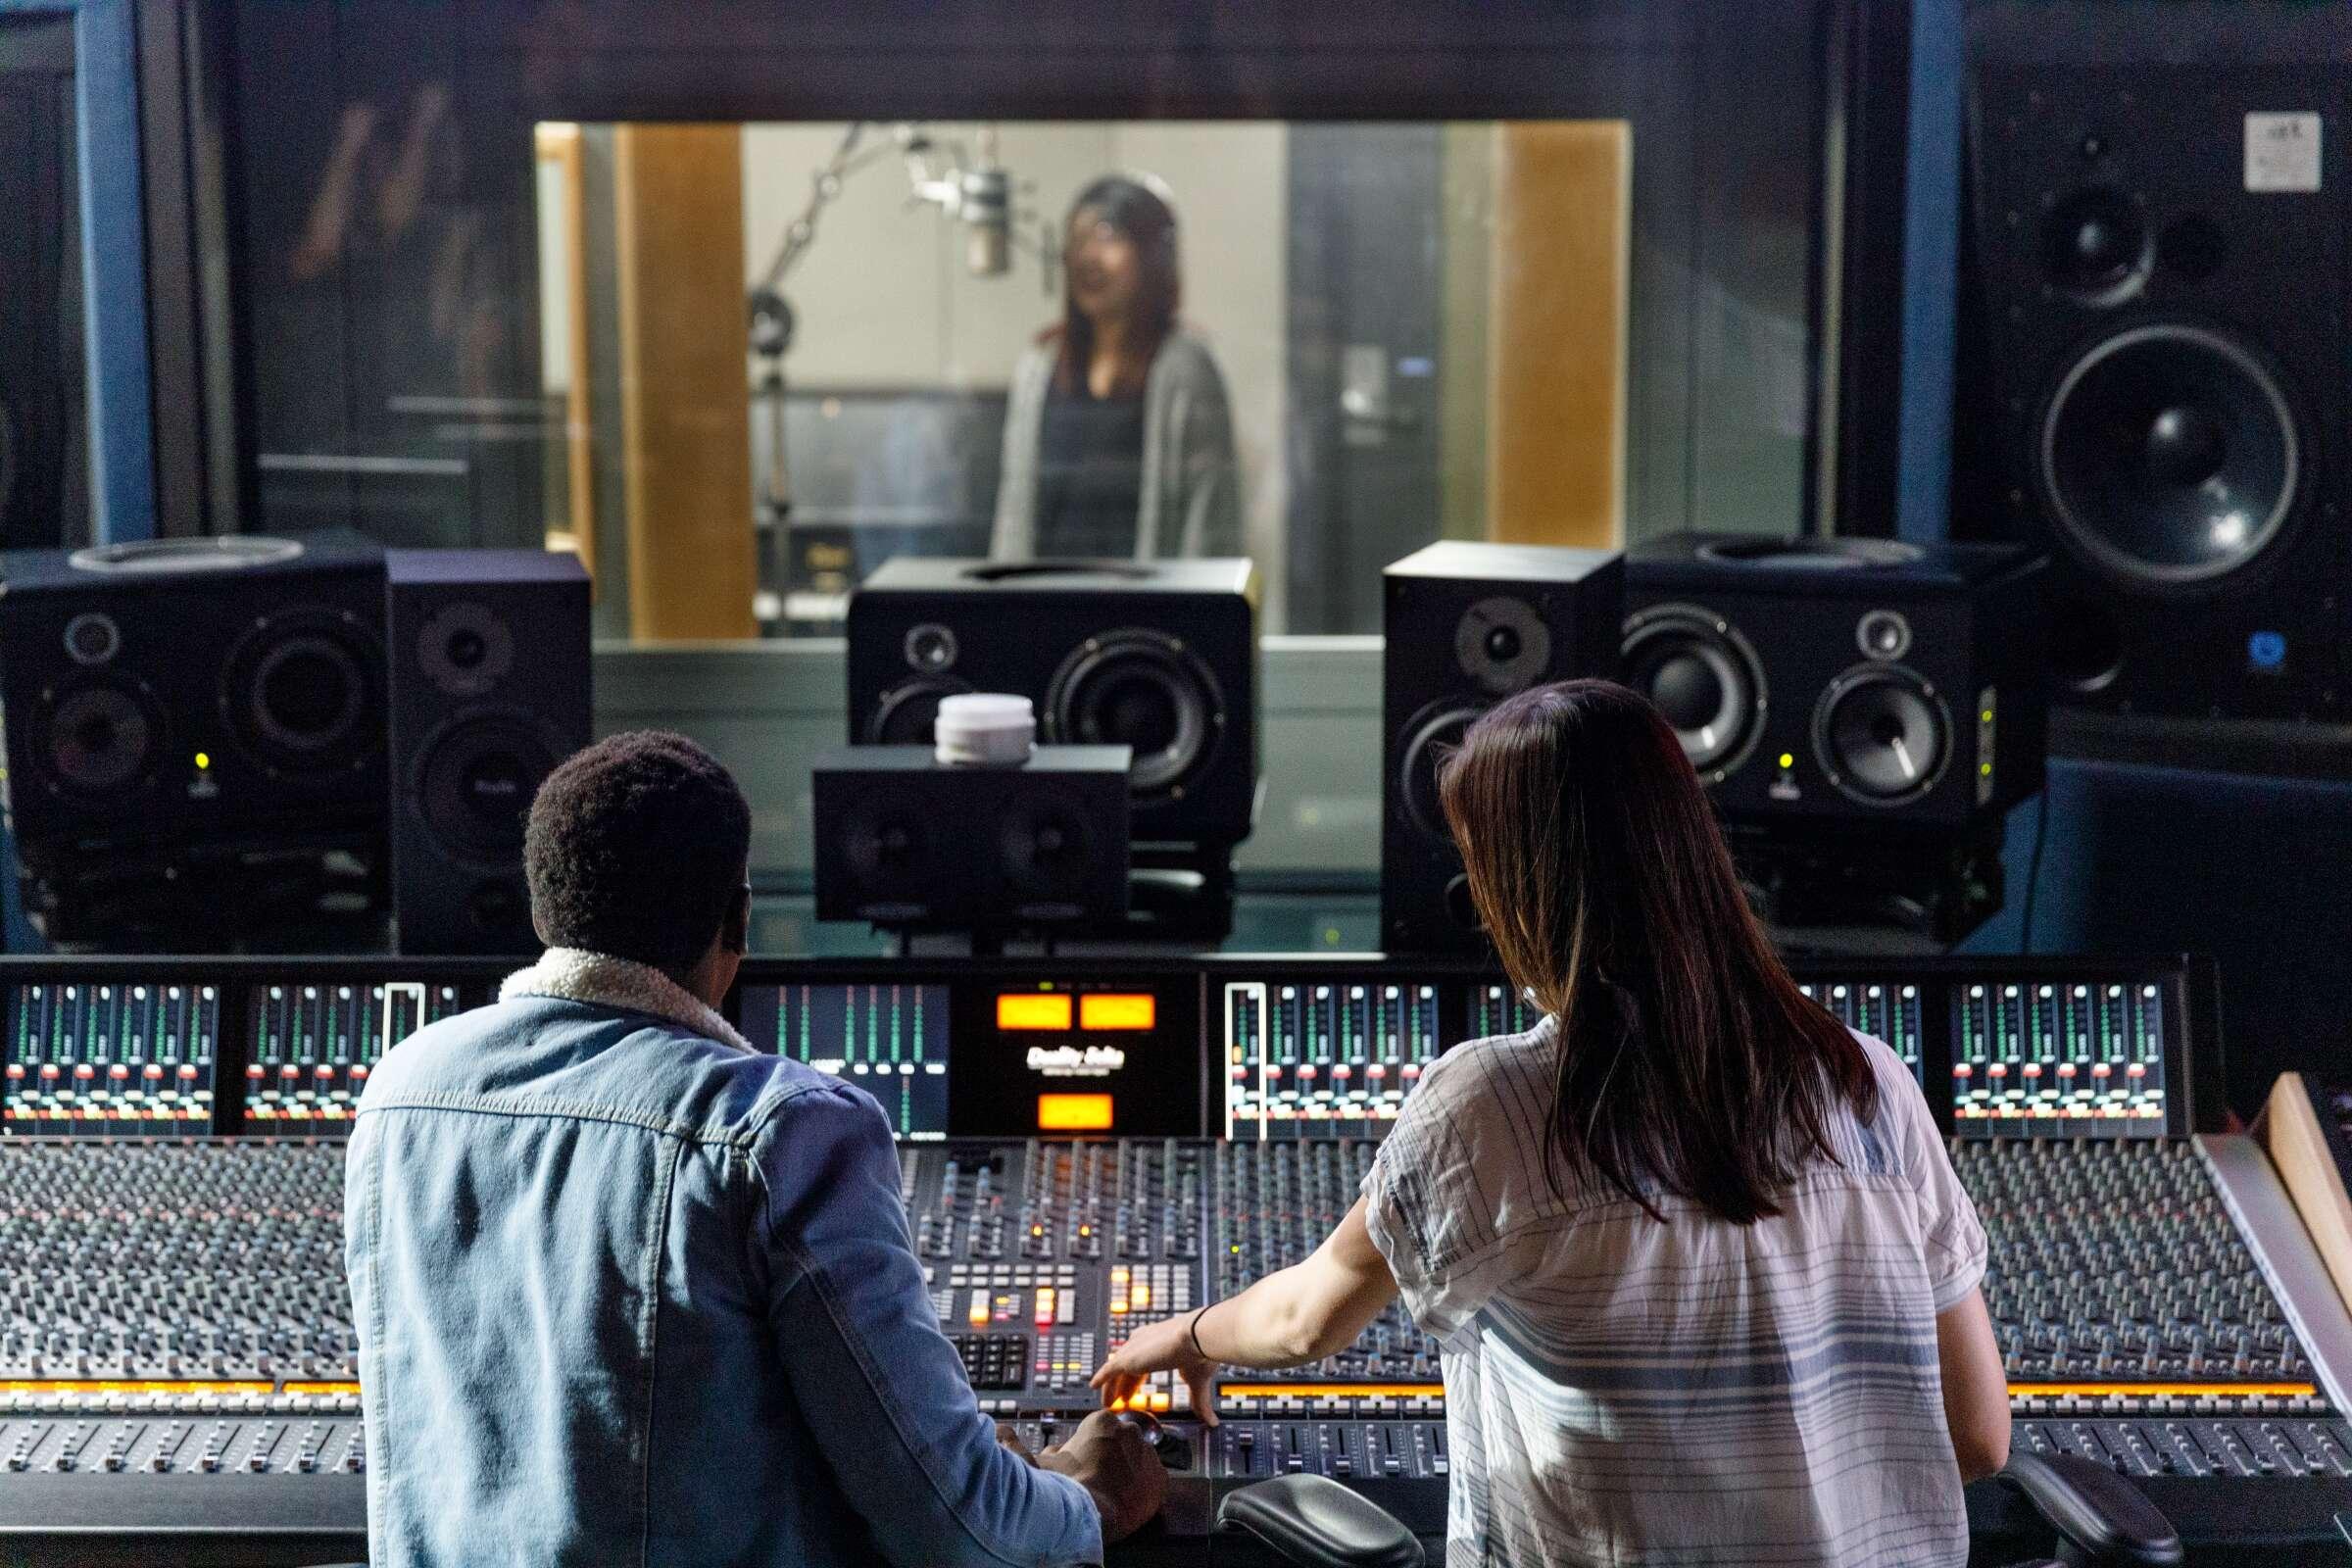 Music Business Degree